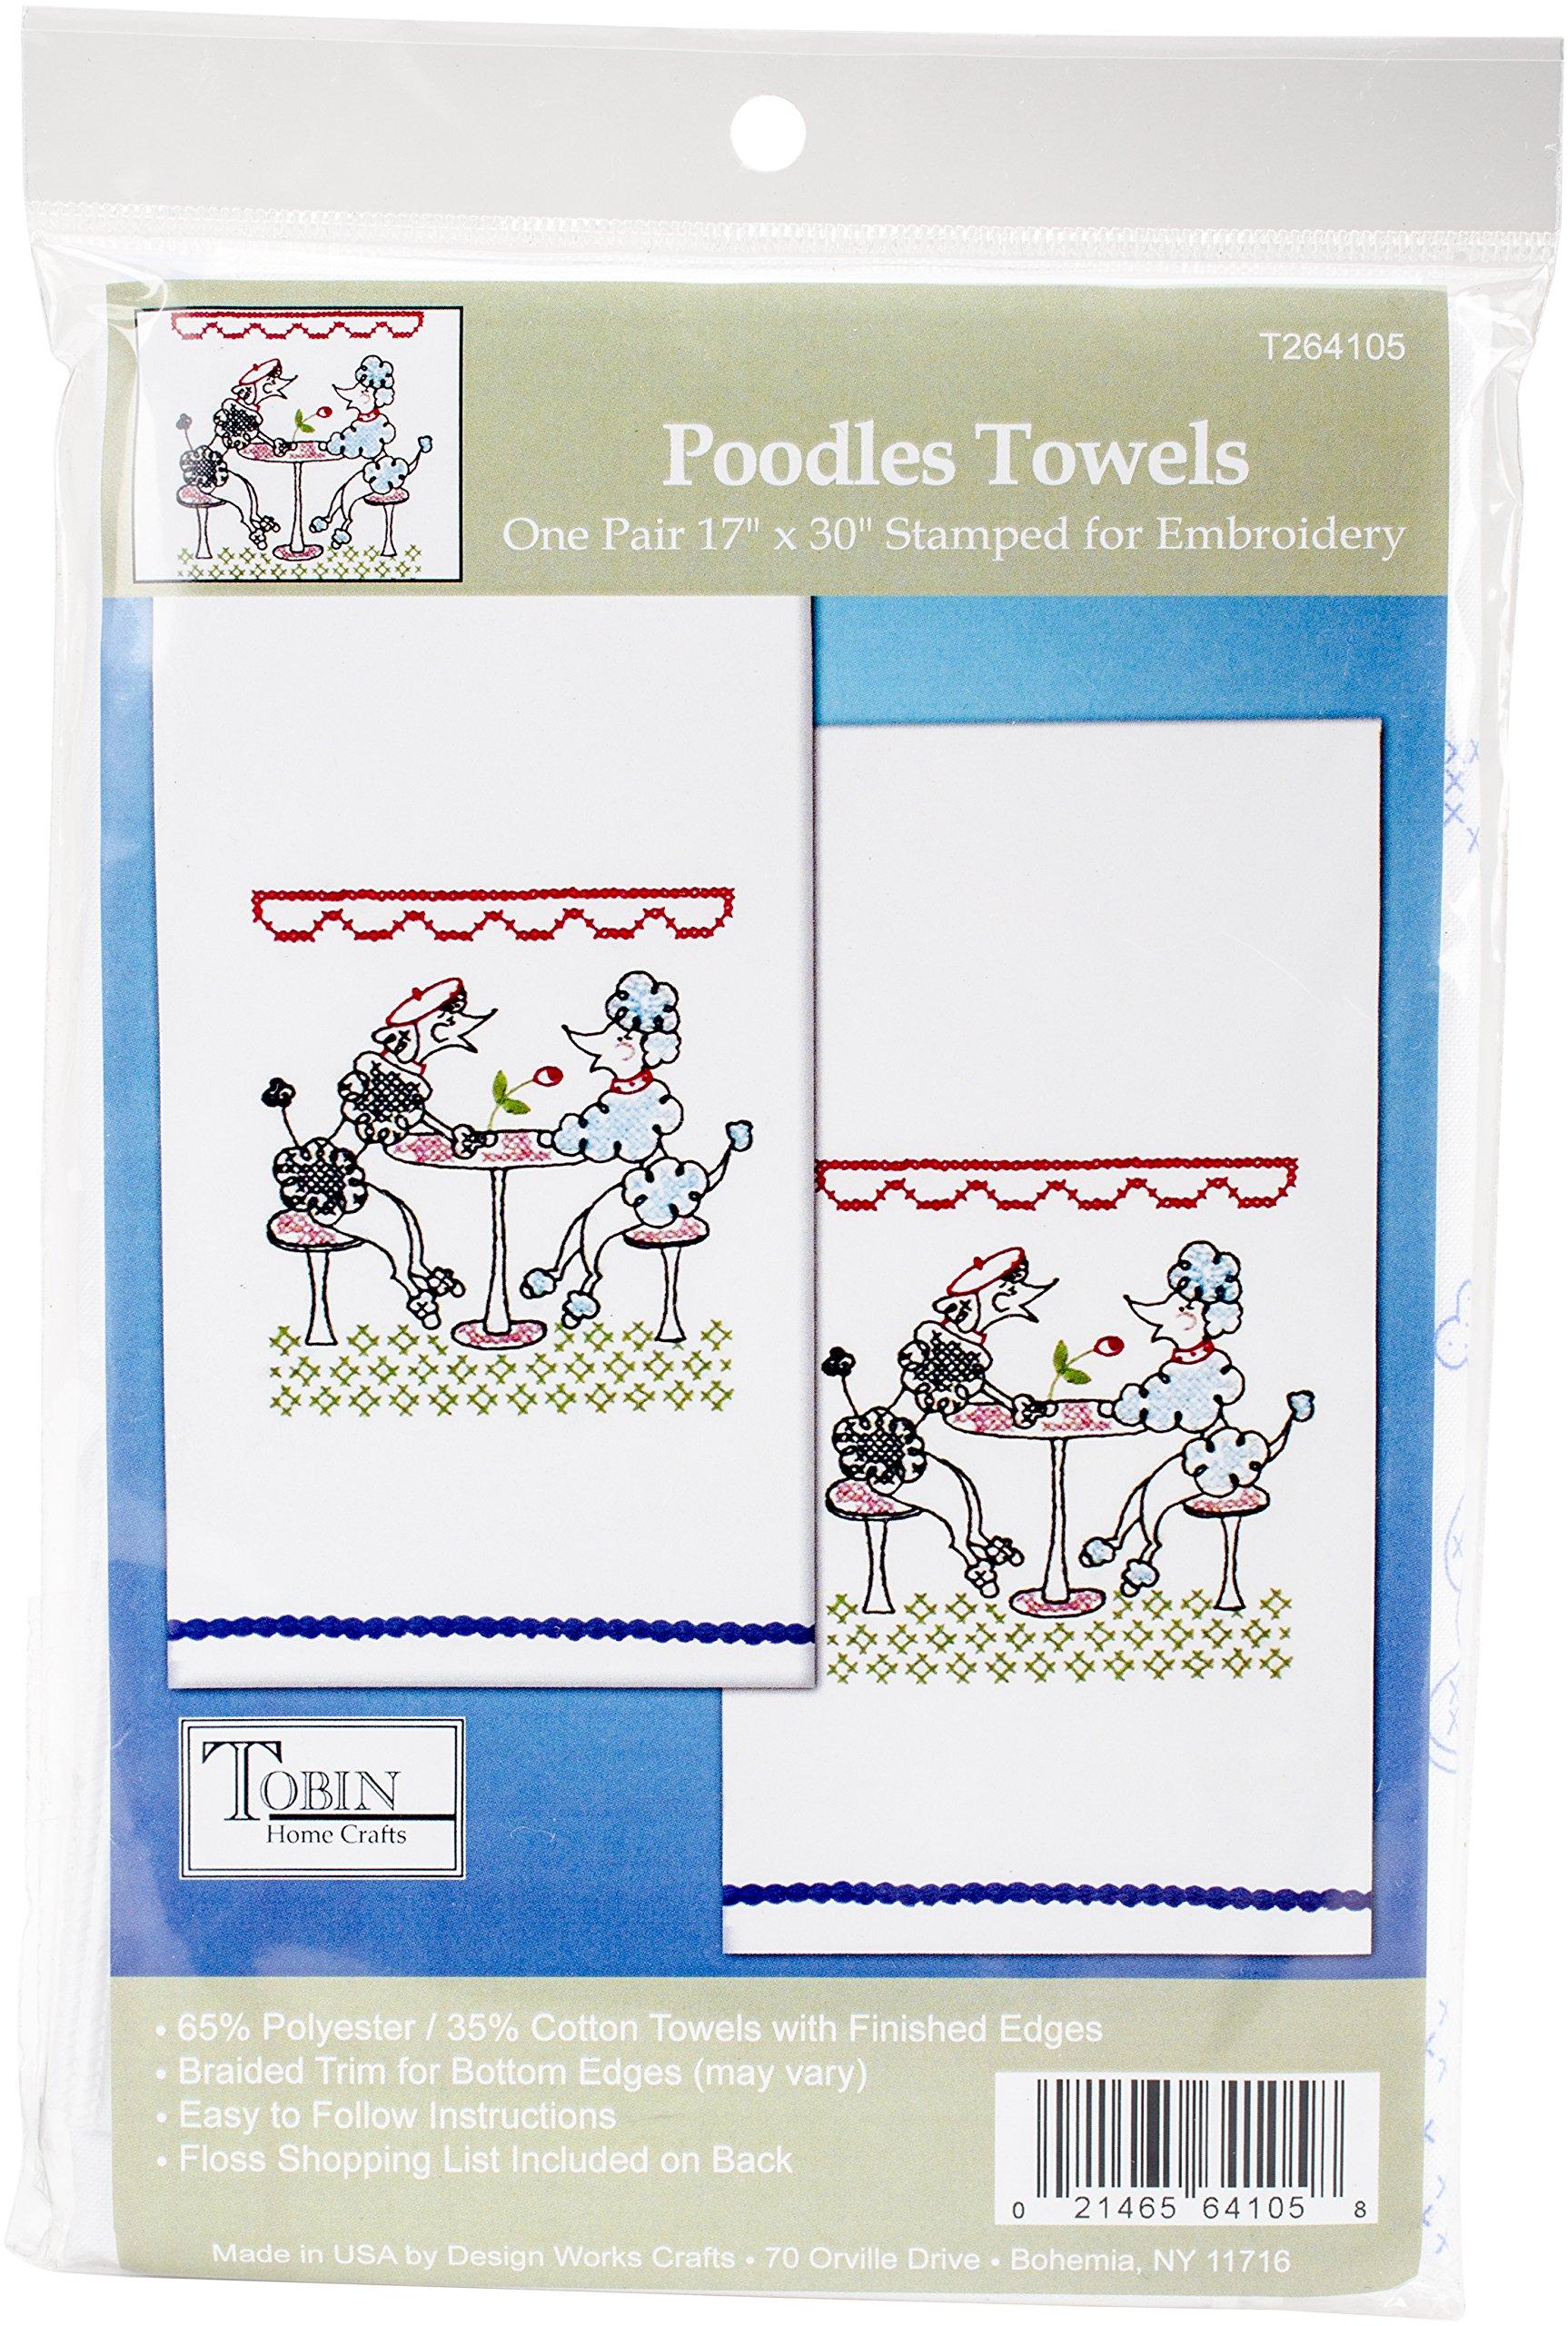 Tobin Stamped For Embroidery Kitchel Towels 18''X28'' 2/Pkg-Poodles